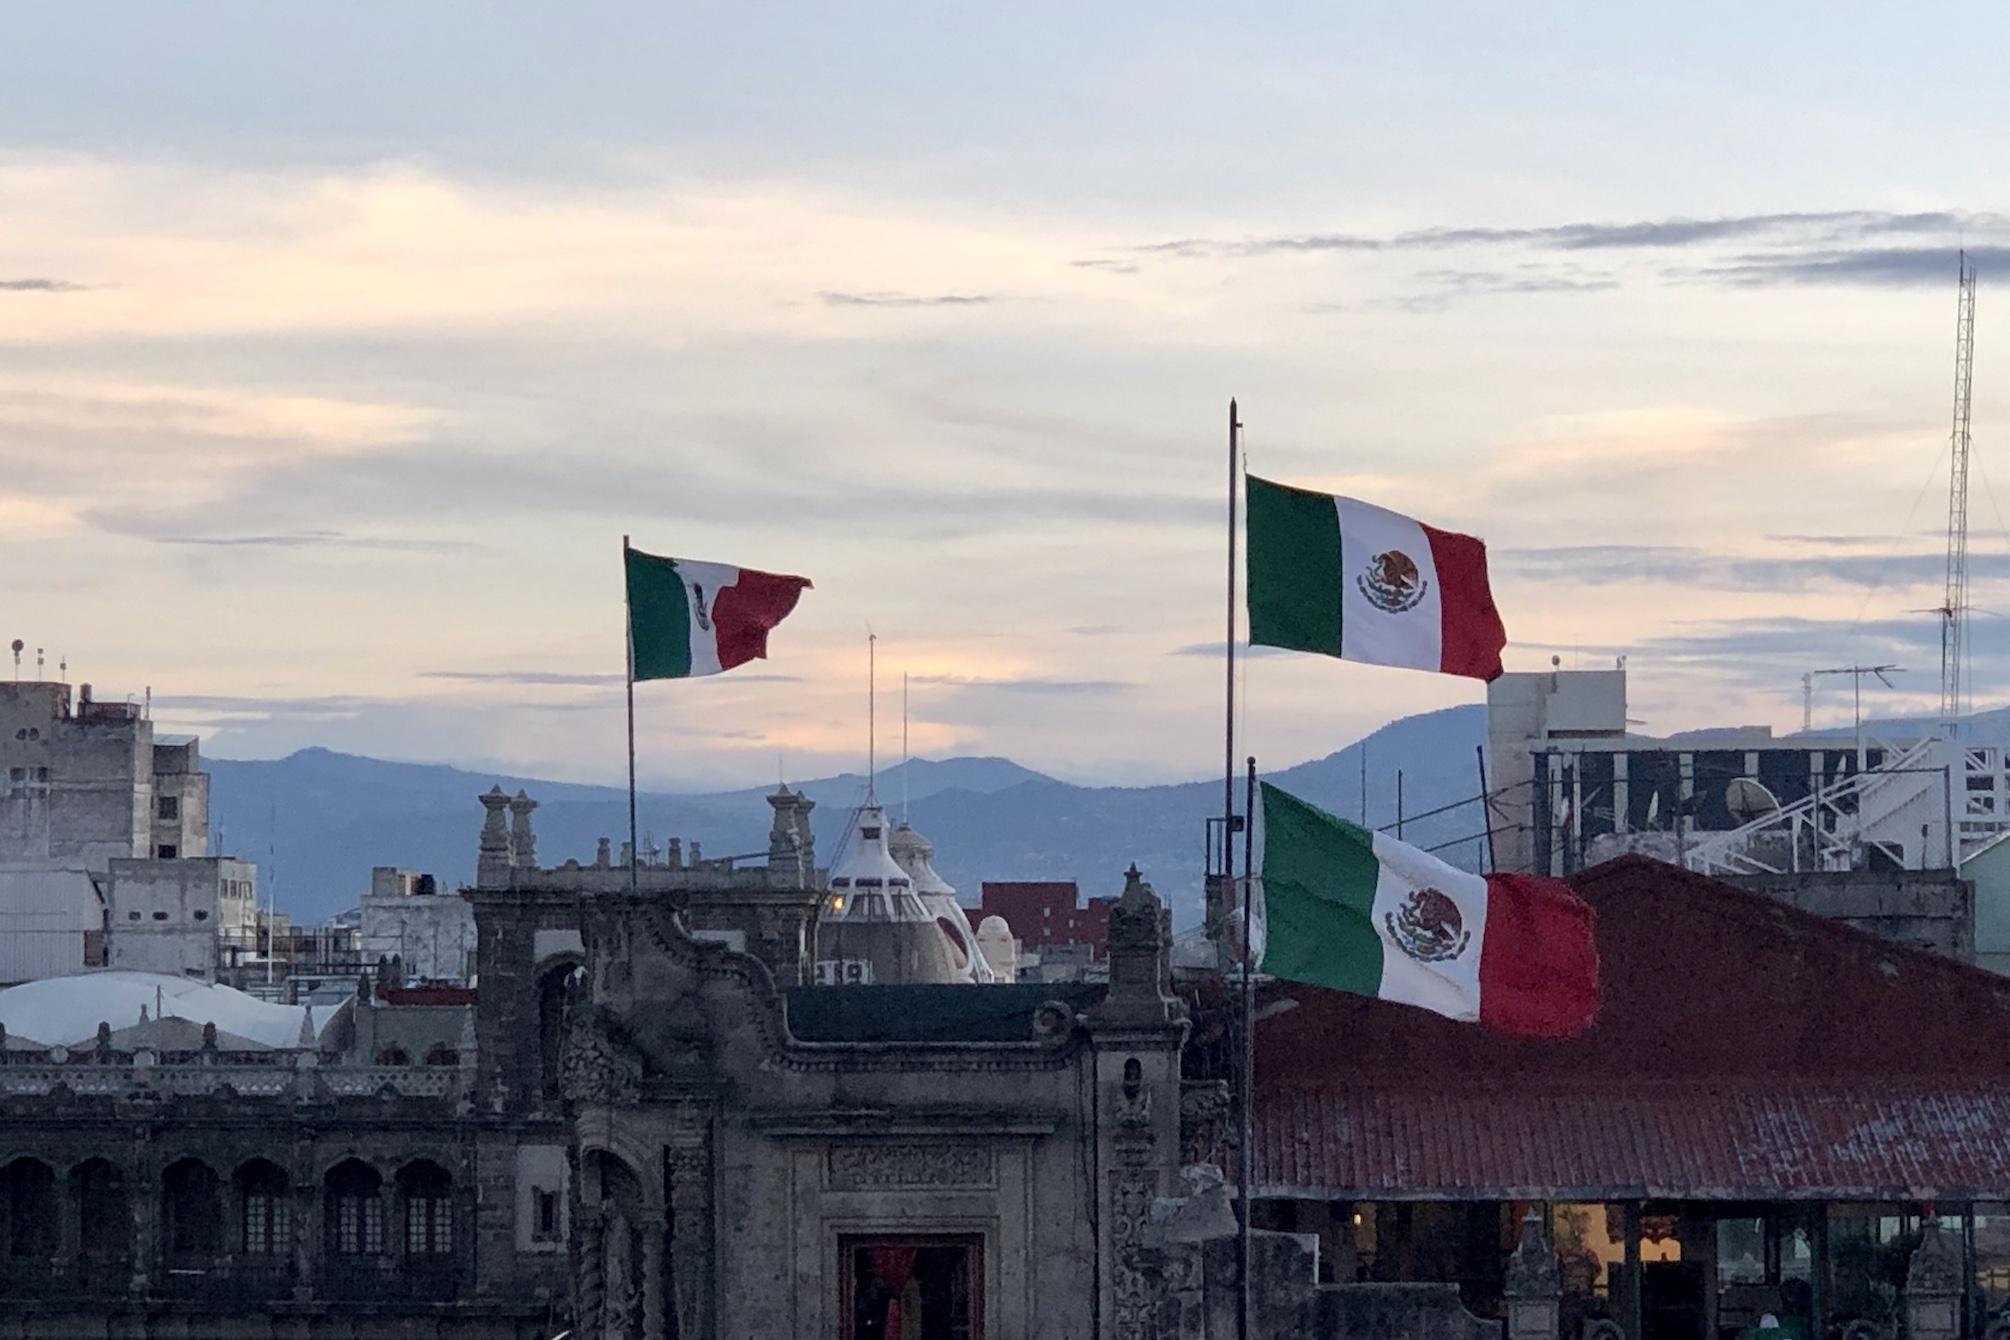 Die Stadt schweigt und die Vögel singen - www.expatmamas.de/blog/ #expatmamas #imauslandzuhause #mexiko